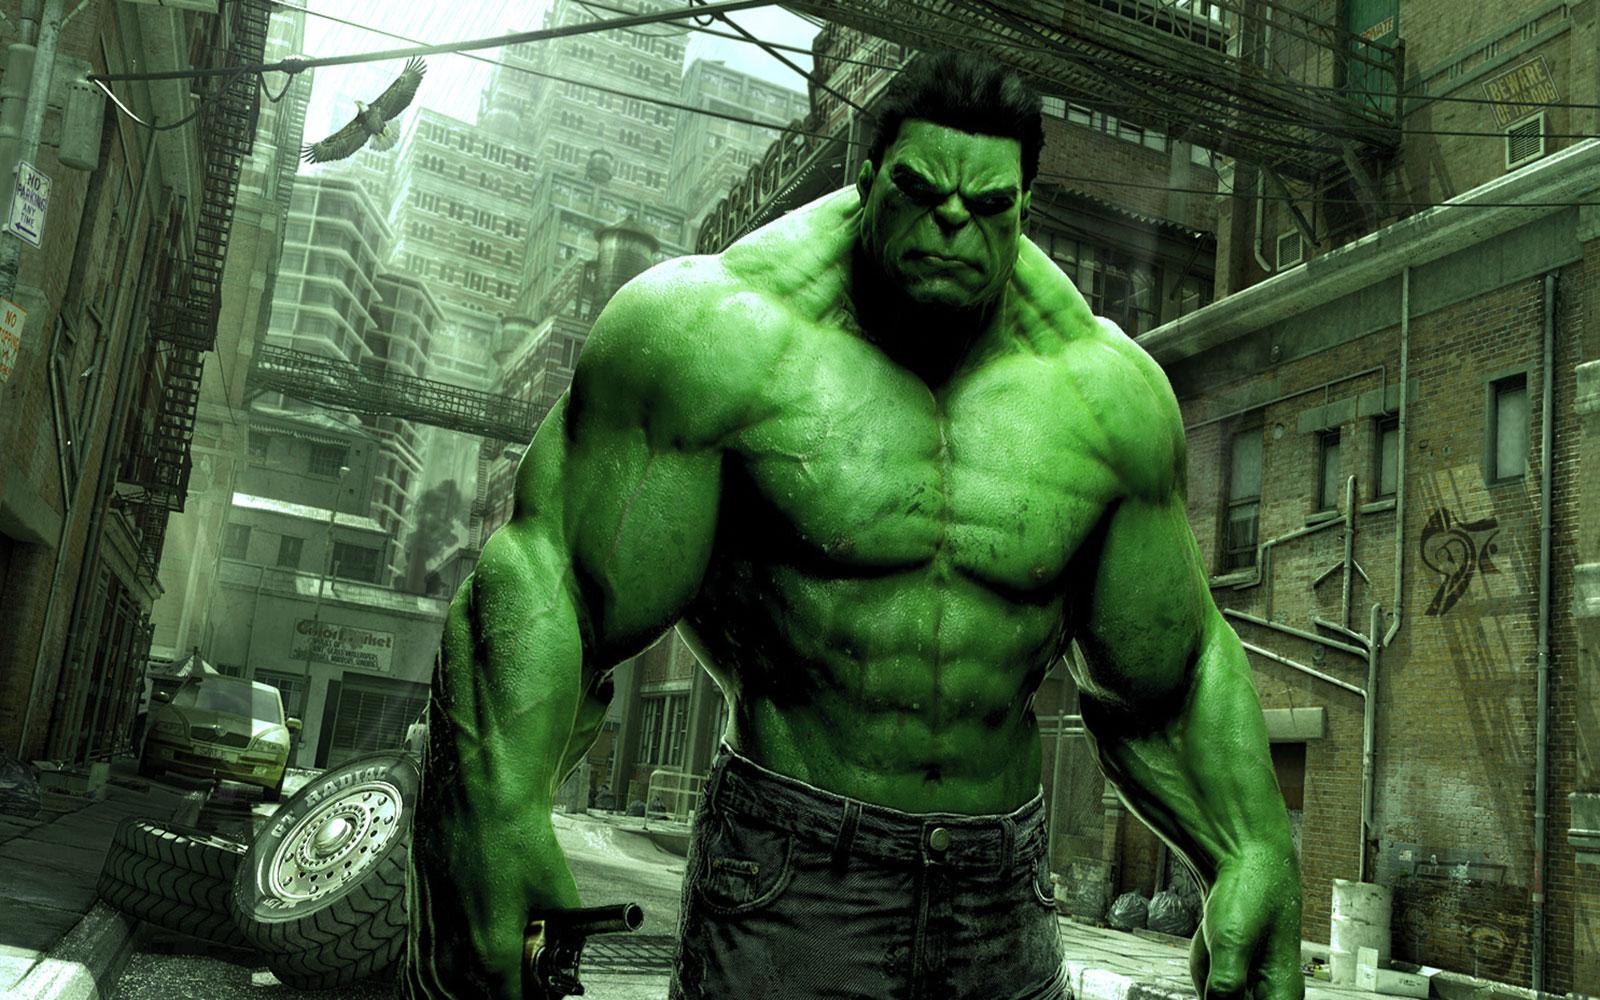 Simple Wallpaper Marvel The Incredible Hulk - 512998  Best Photo Reference_472182.jpg